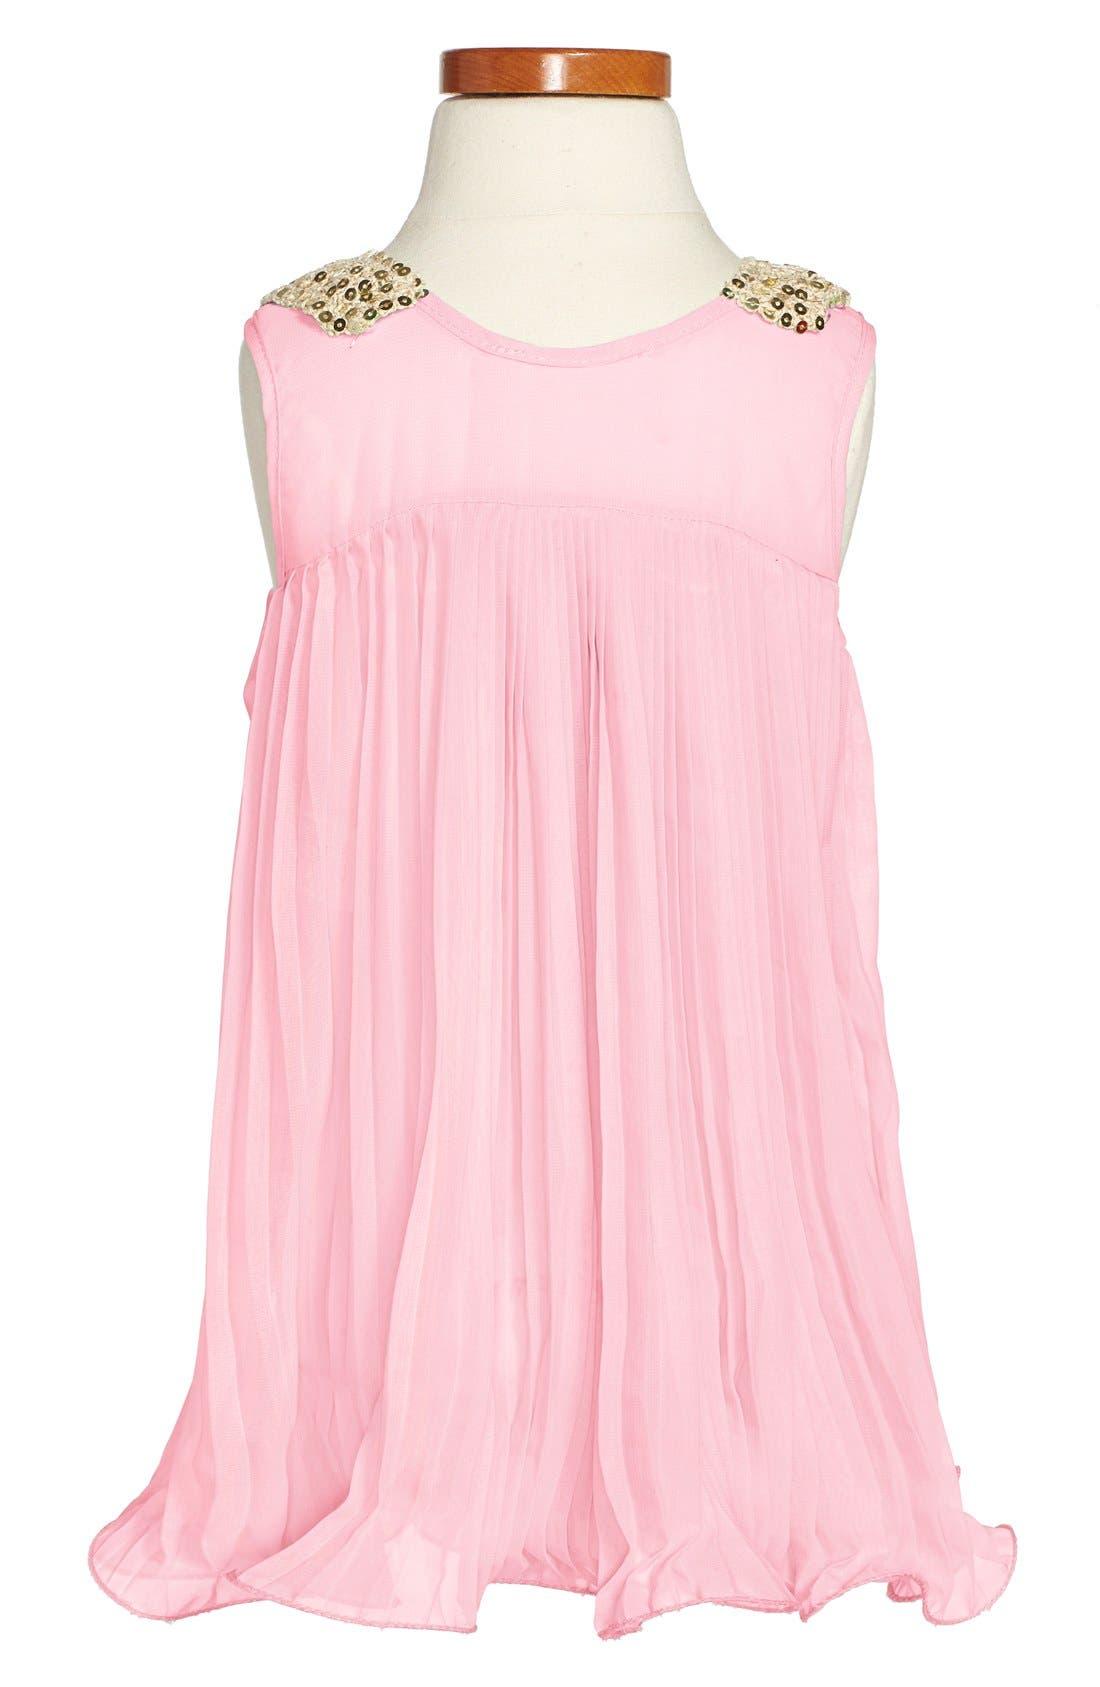 Alternate Image 2  - Popatu Pleated Sleeveless Dress (Toddler Girls & Little Girls)